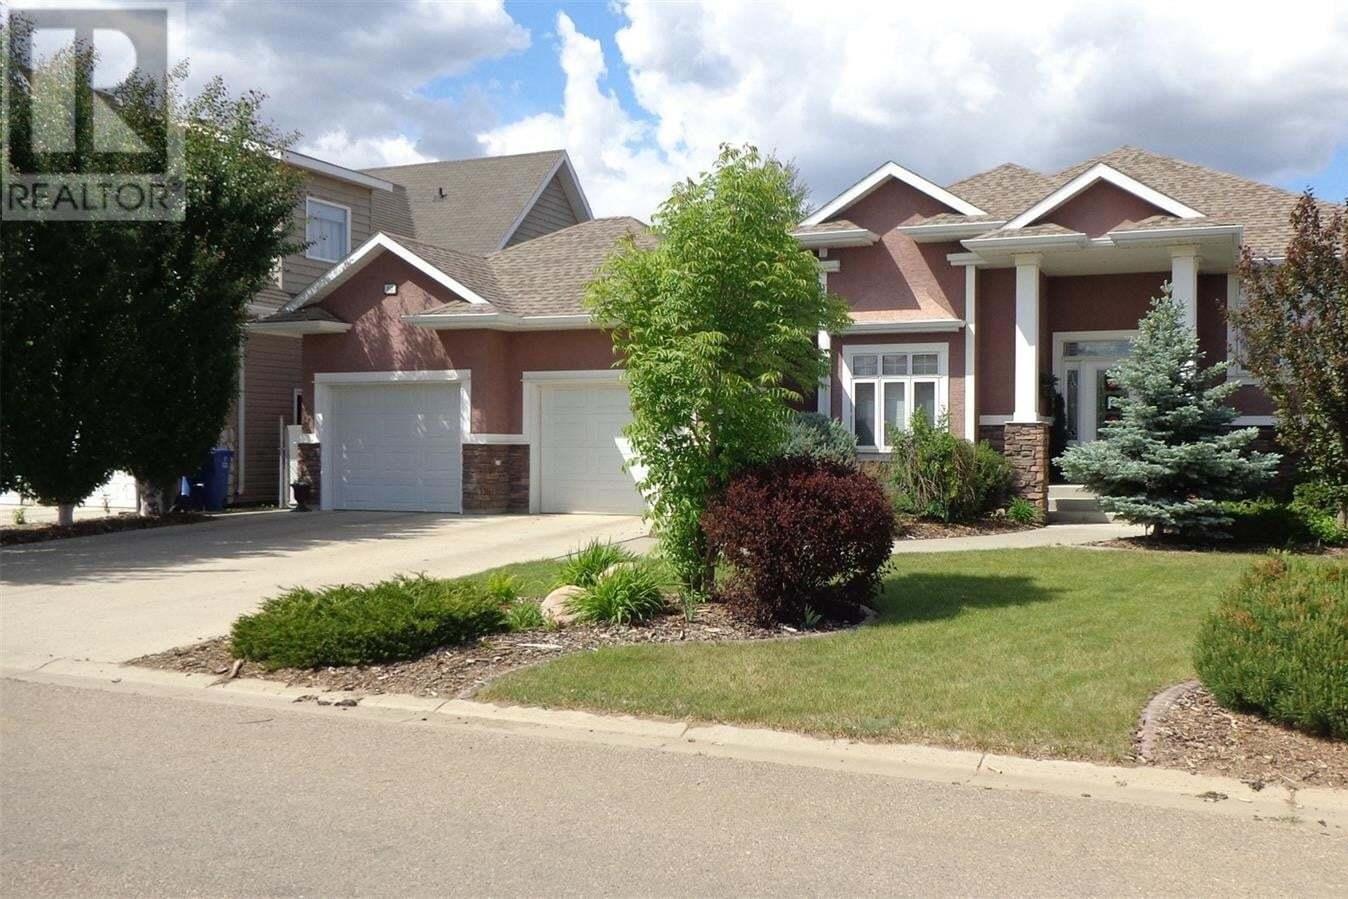 House for sale at 182 15th St Battleford Saskatchewan - MLS: SK811004